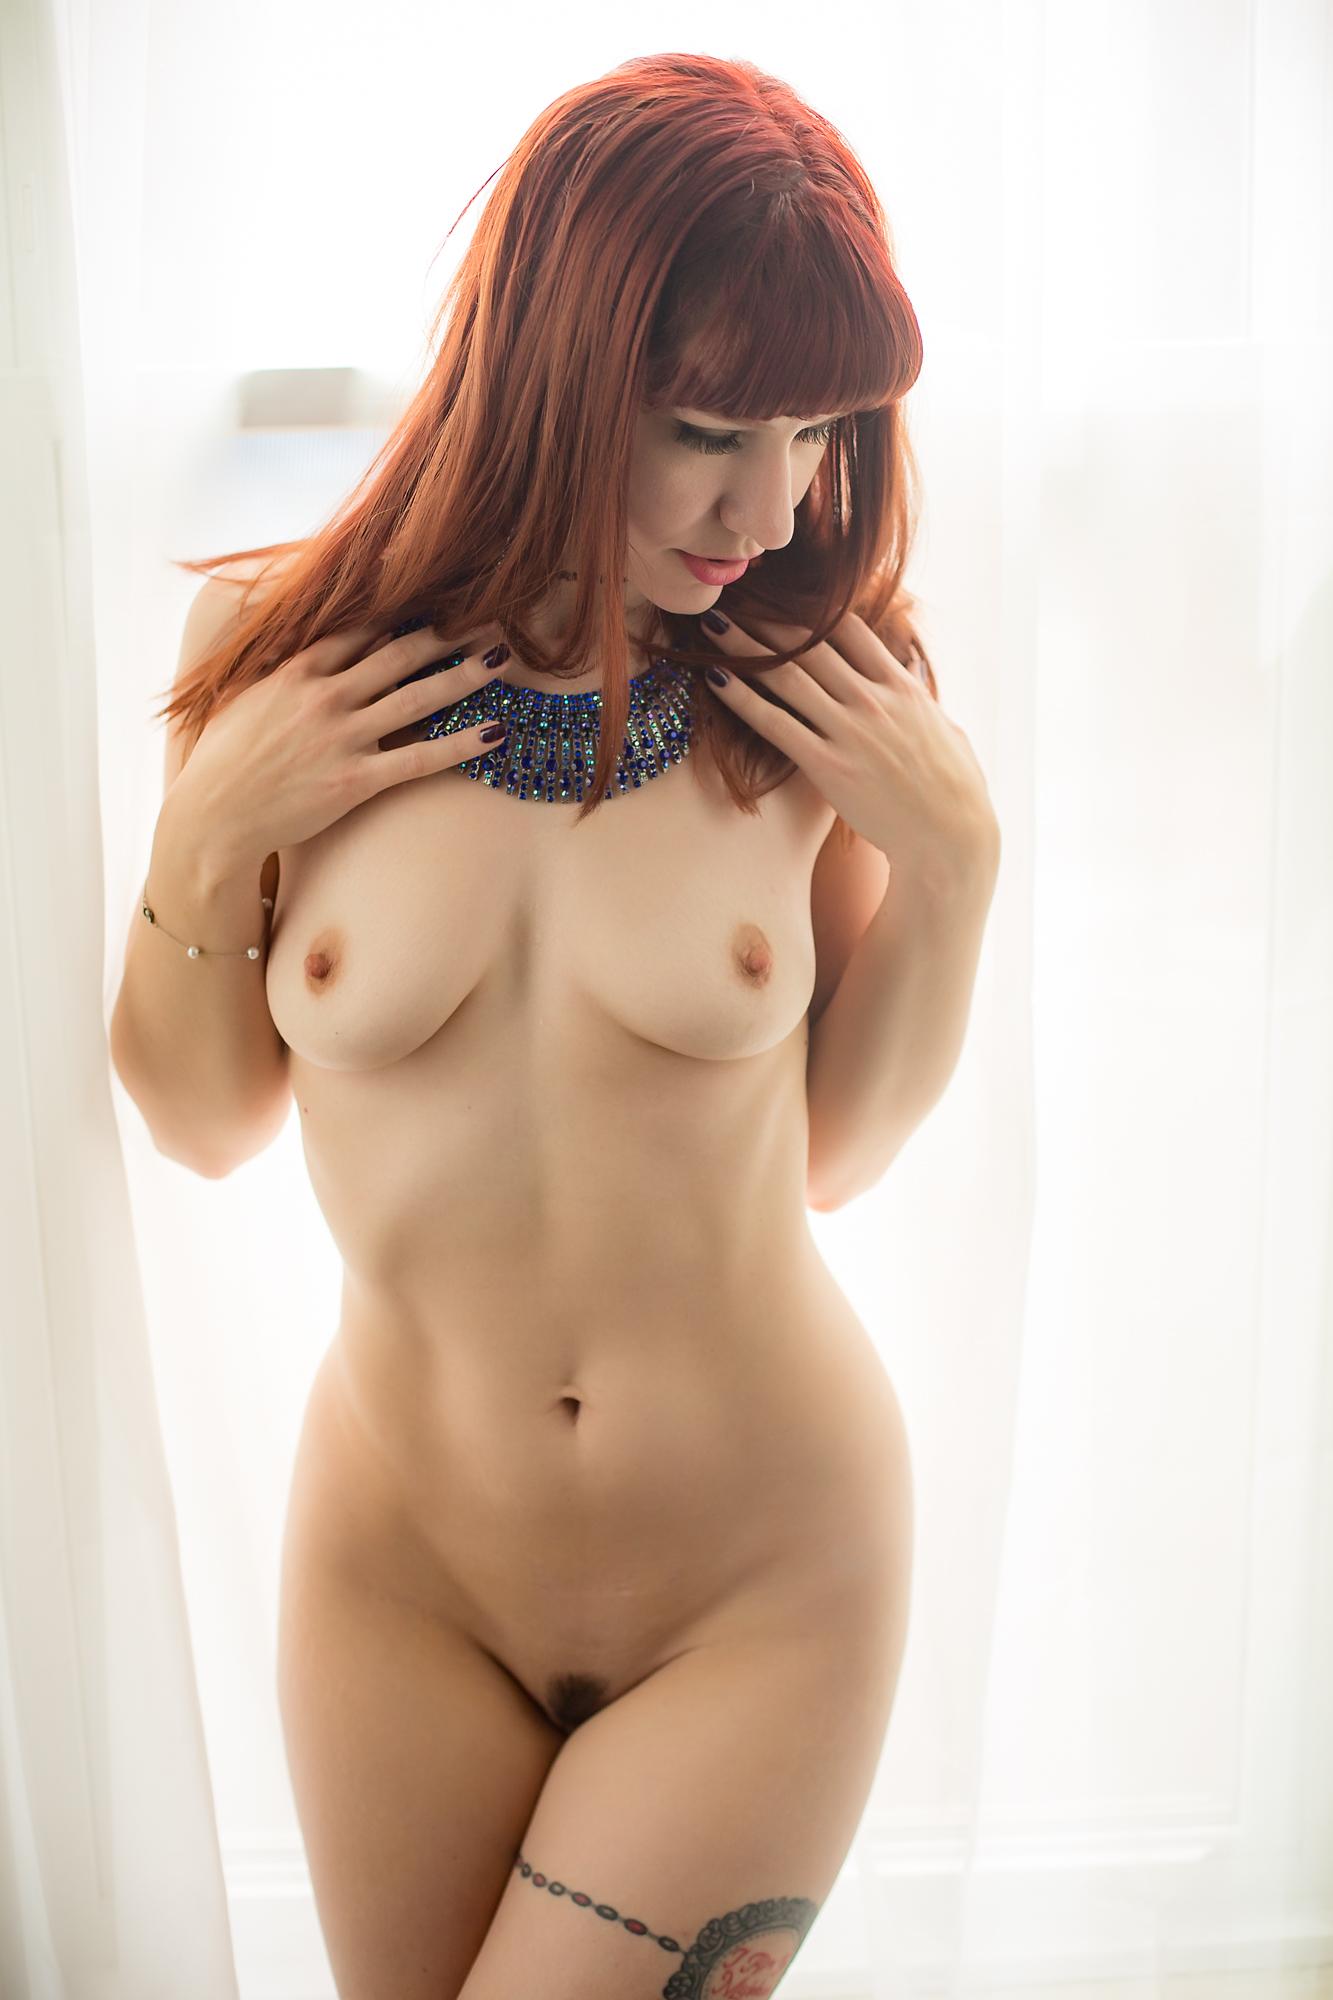 _09A9466-Edit.jpg